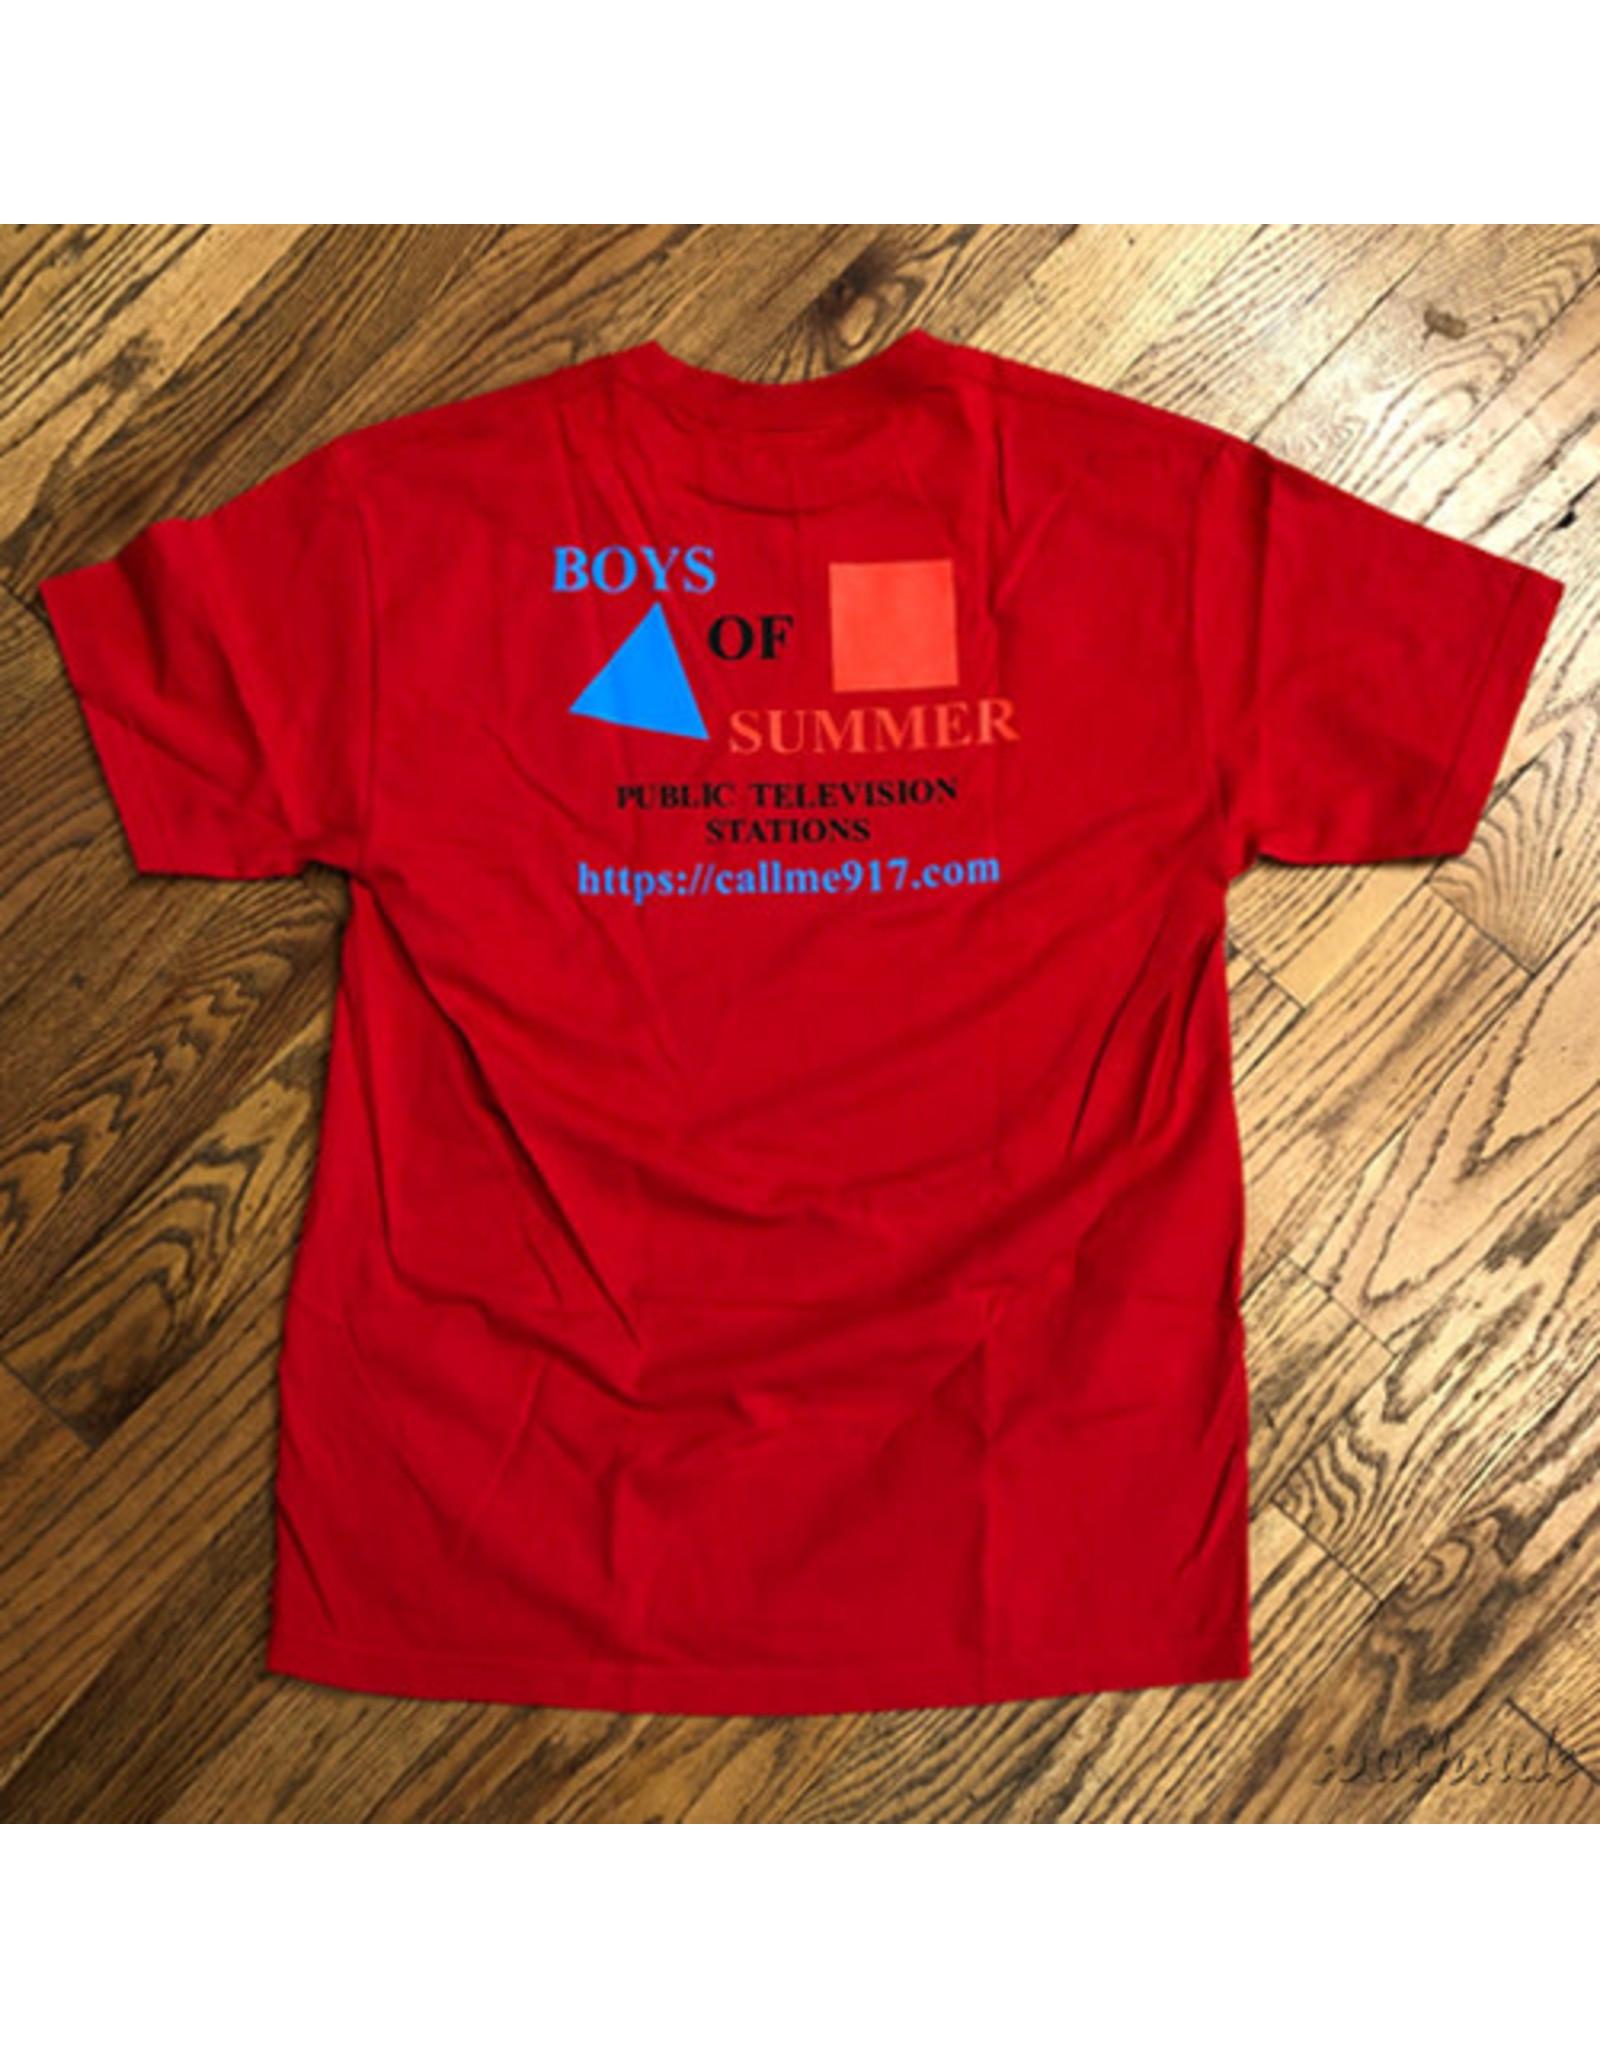 Boys of Summer Boys of Summer Tee CPB Red